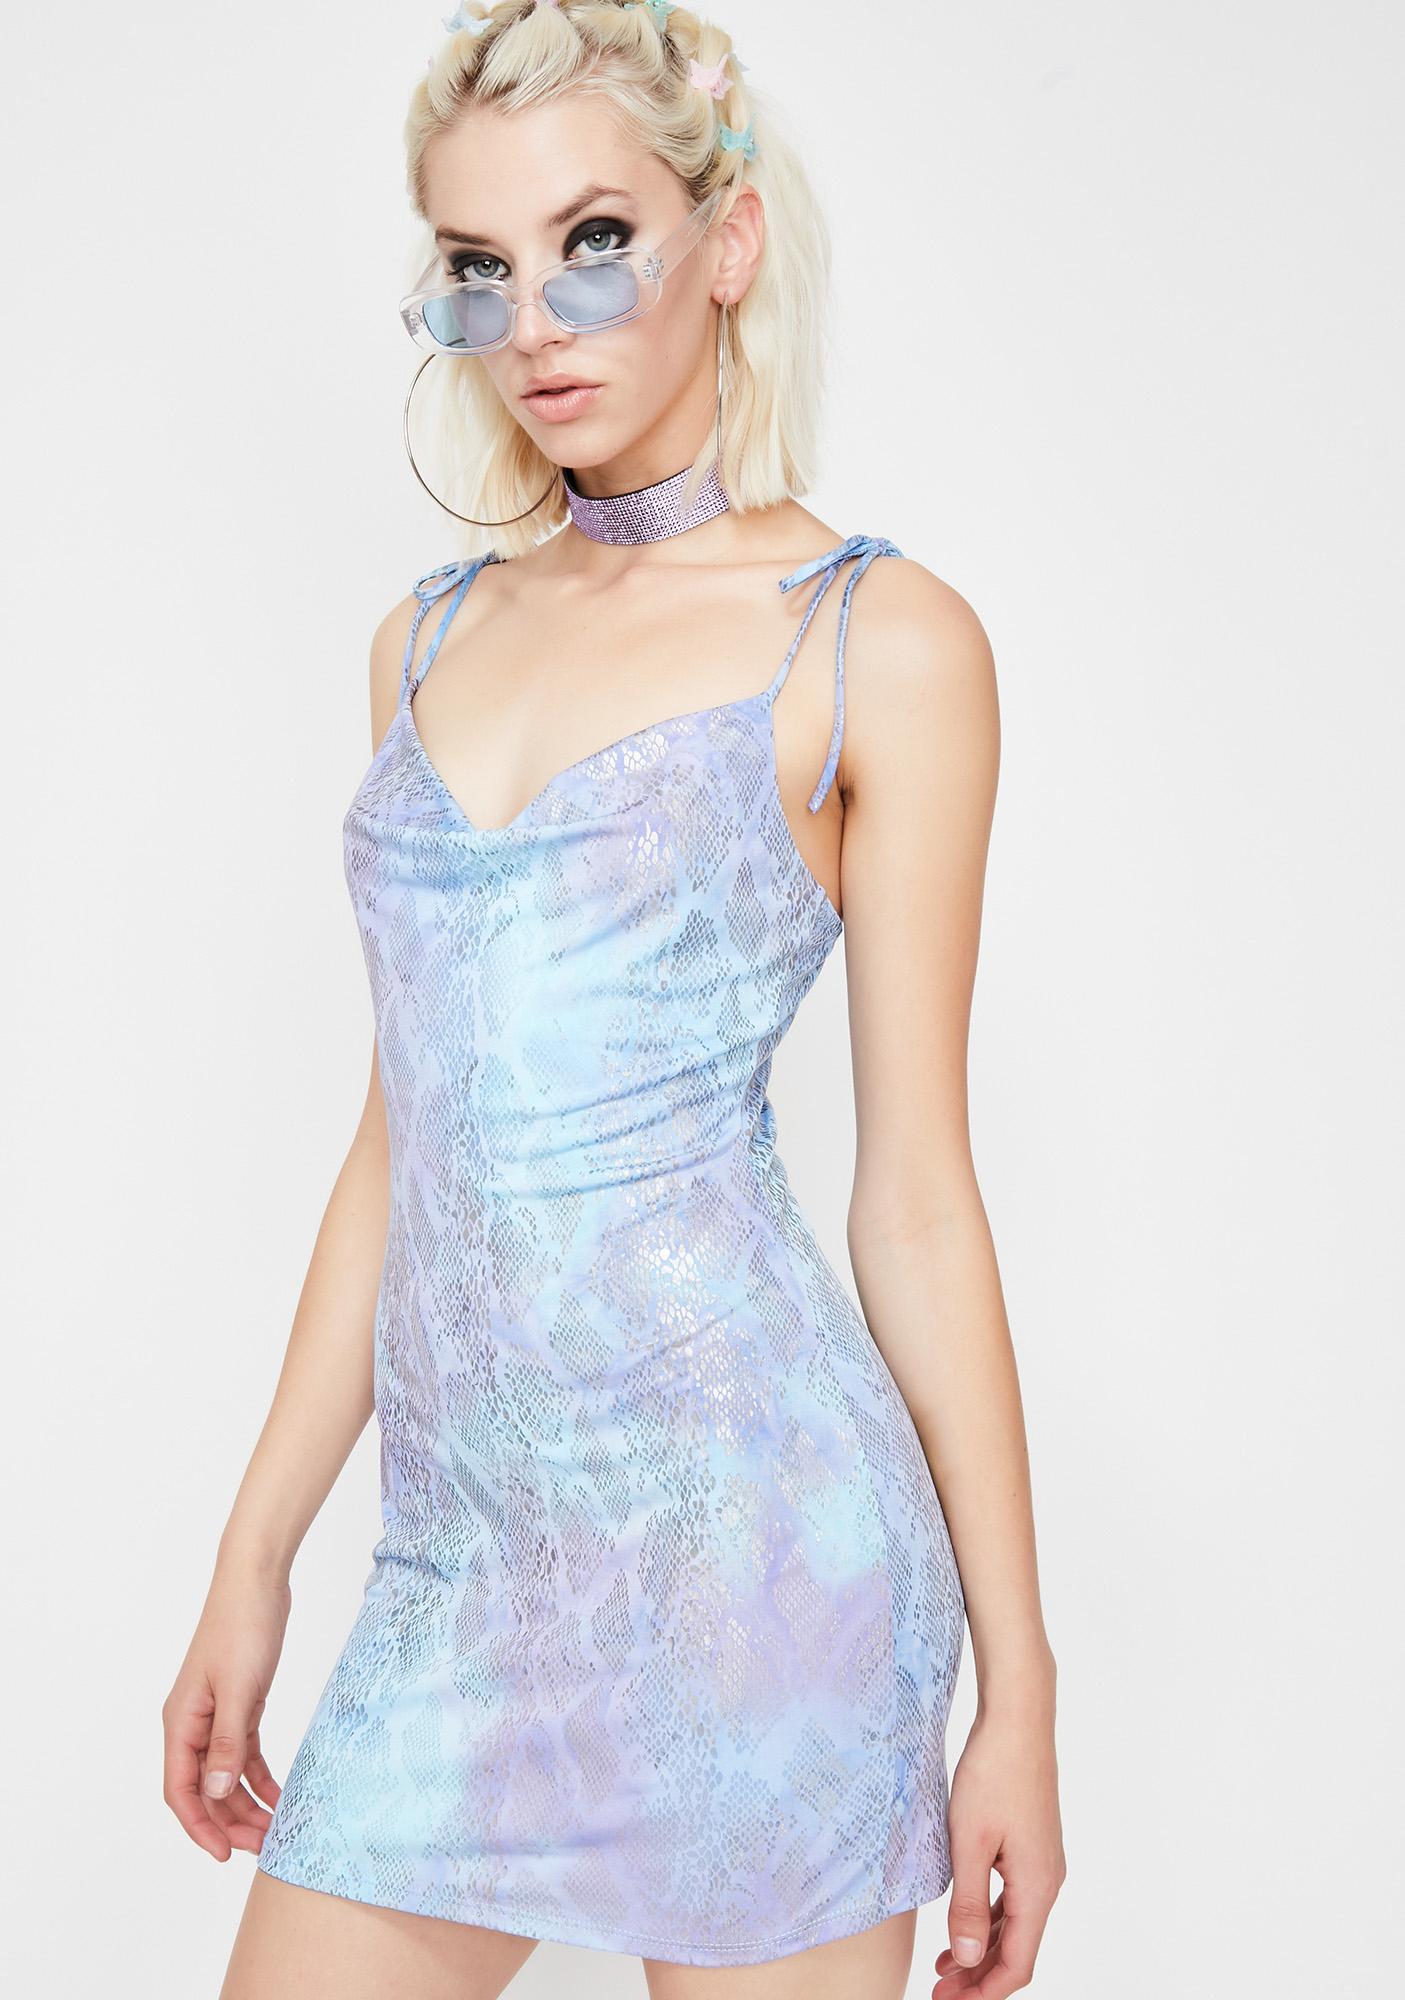 Glamtopia Bliss Mini Dress